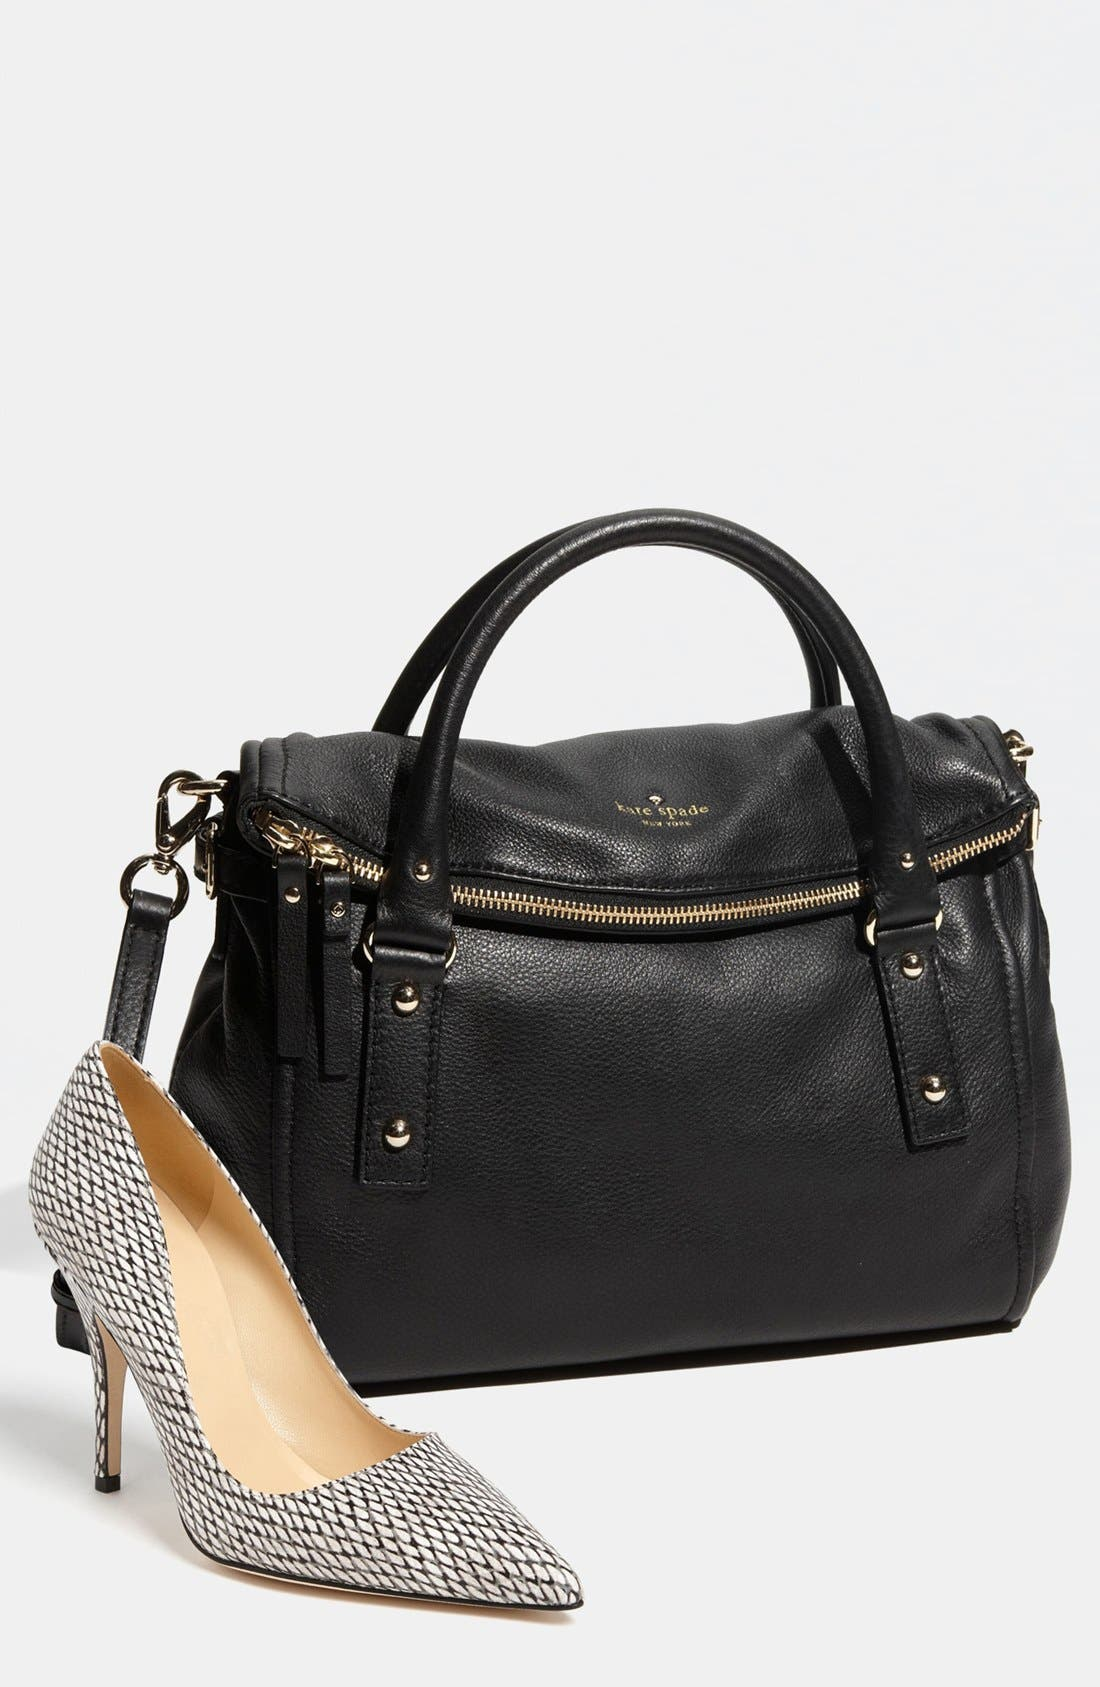 KATE SPADE NEW YORK, 'cobble hill - leslie small' leather satchel, Alternate thumbnail 2, color, 001